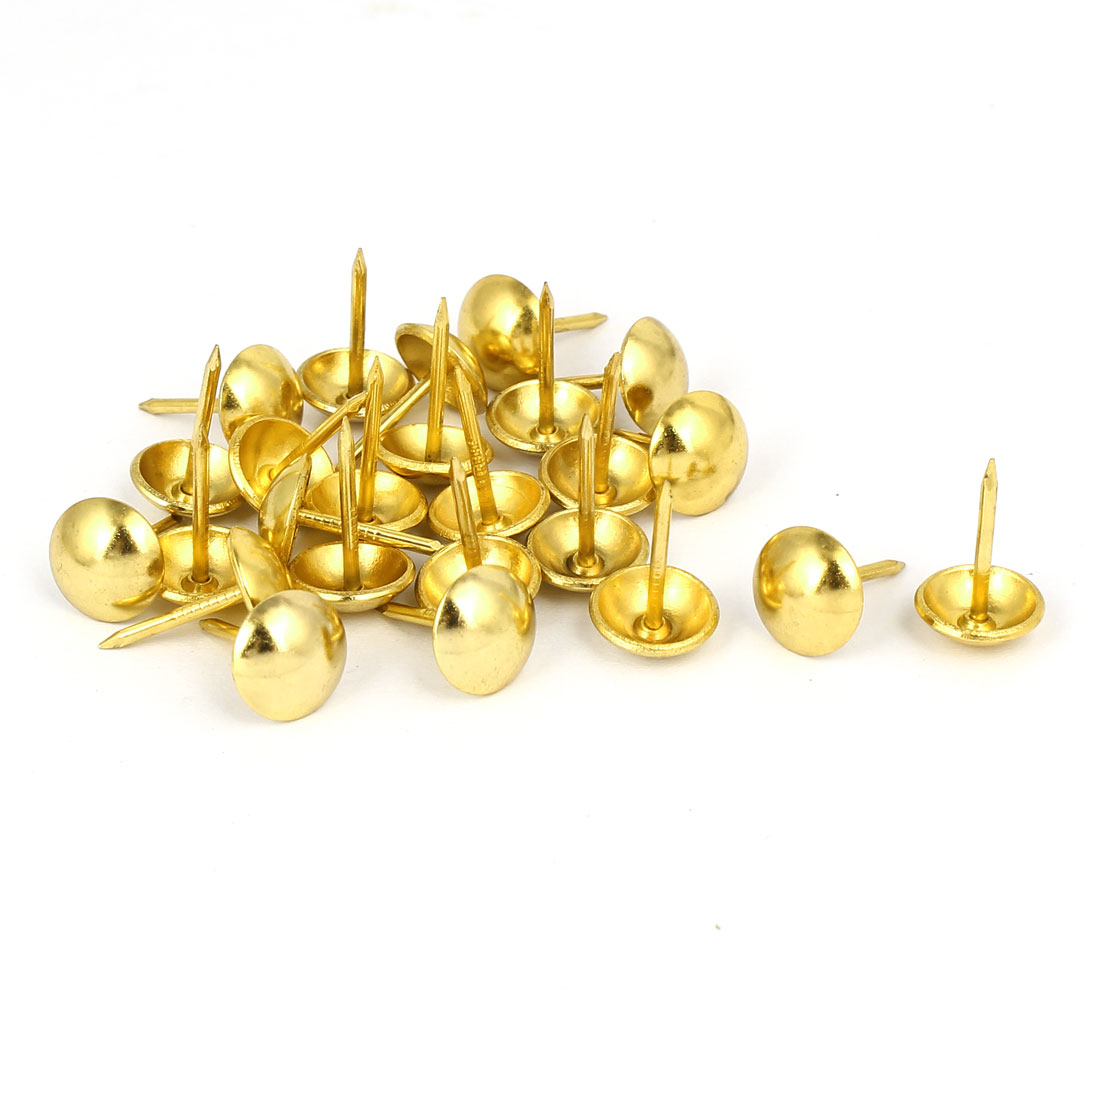 Home Furniture Upholstery Thumb Tack Nail Push Pin Gold Tone 11mm x 17mm 25pcs